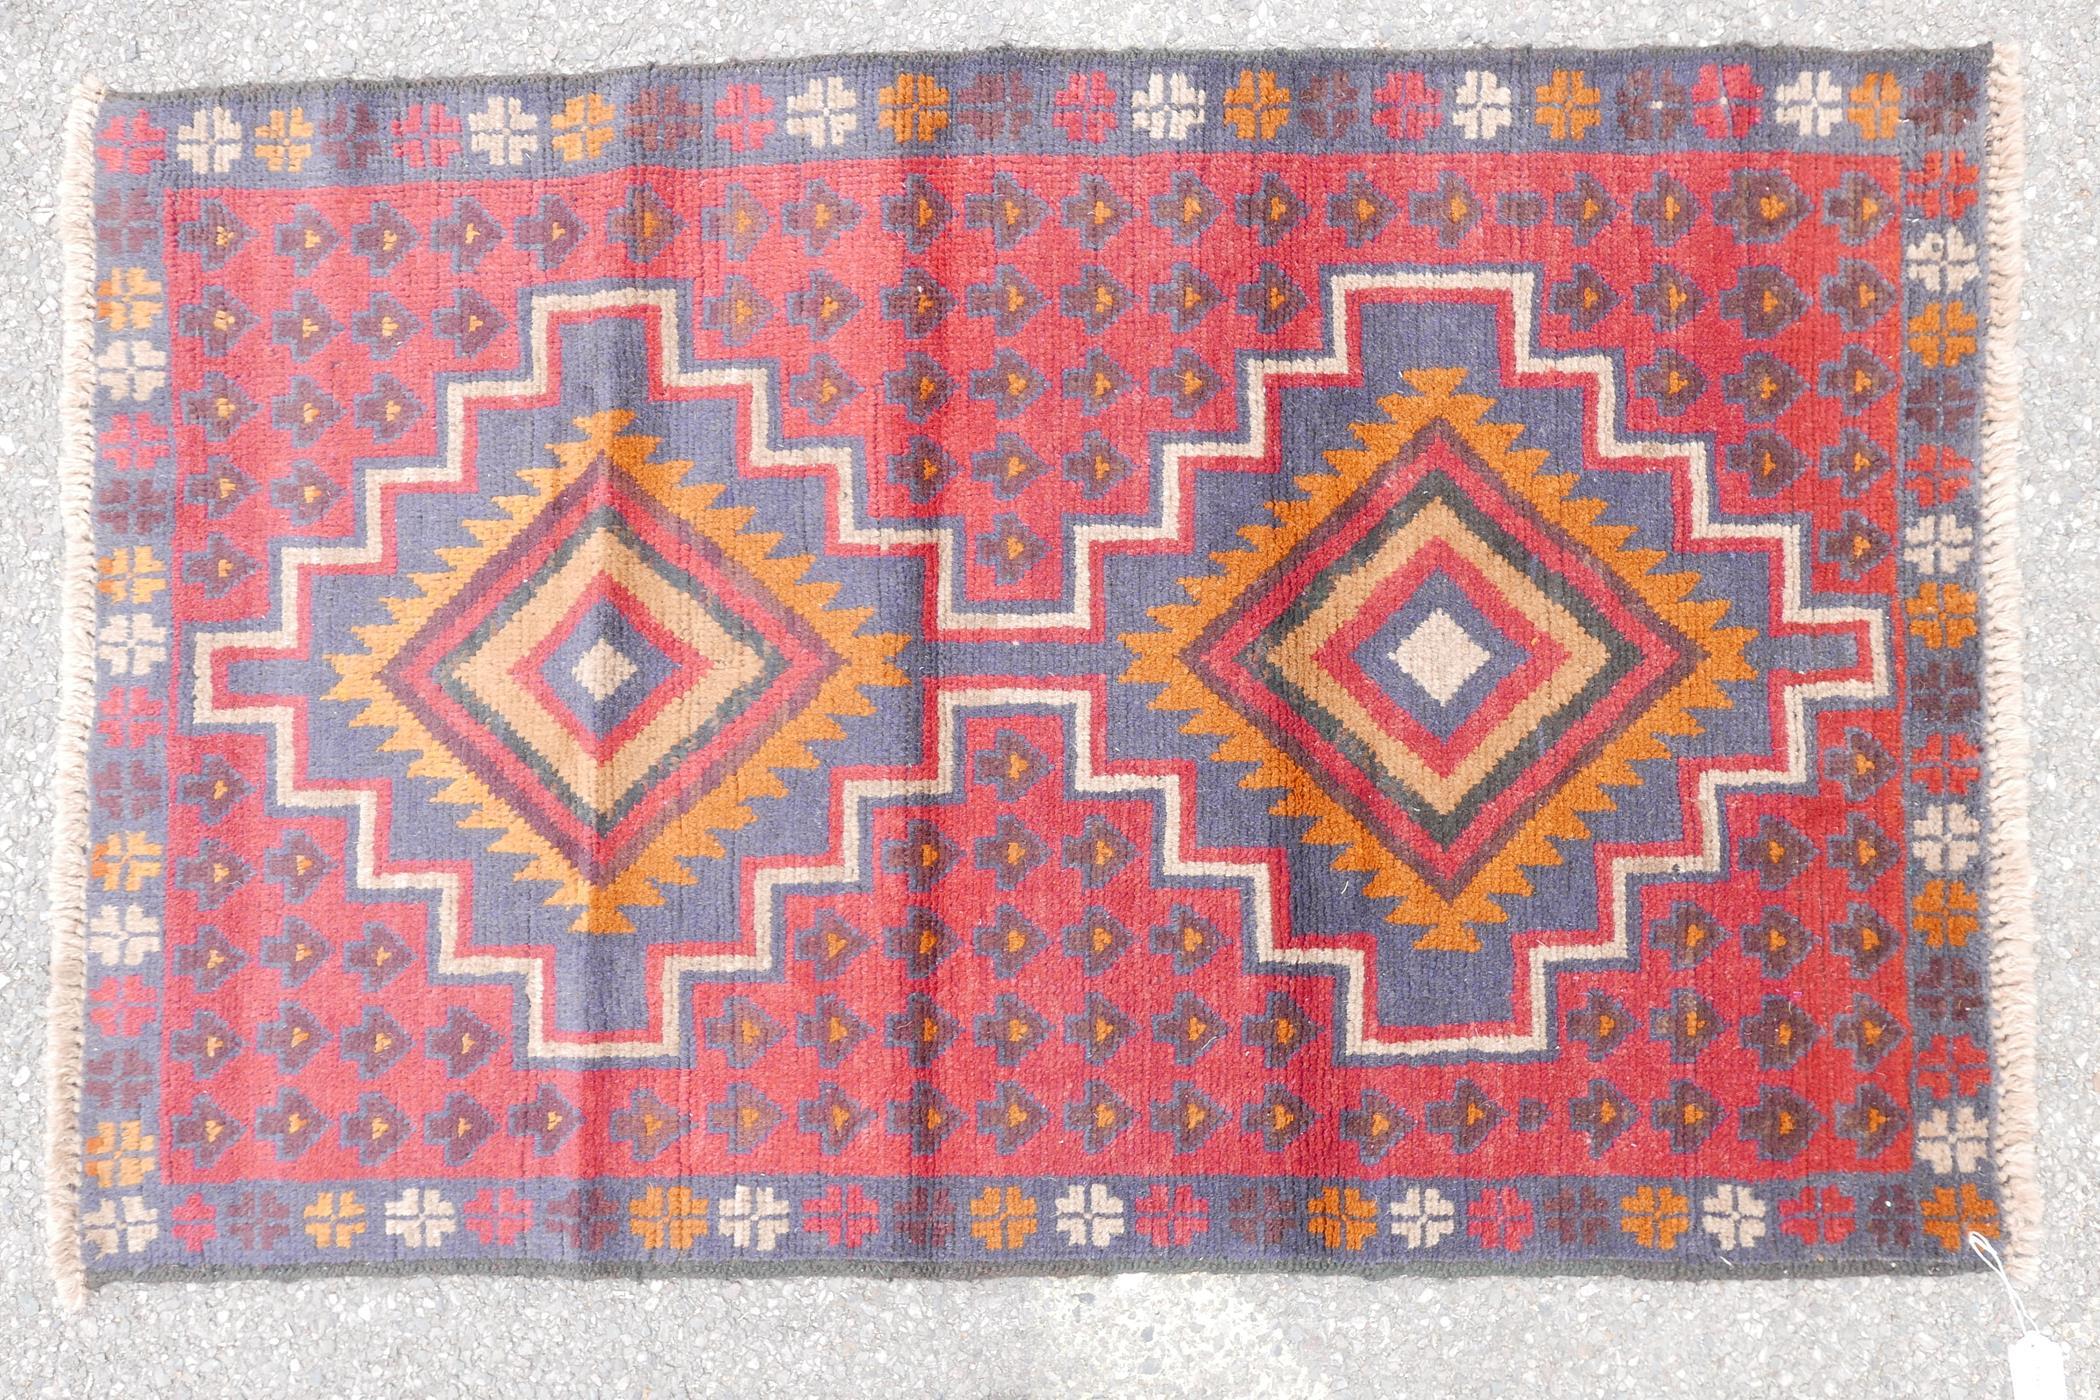 "Full pile red ground Afghan Belouch nomadic rug, 35"" x 56"" - Image 2 of 4"